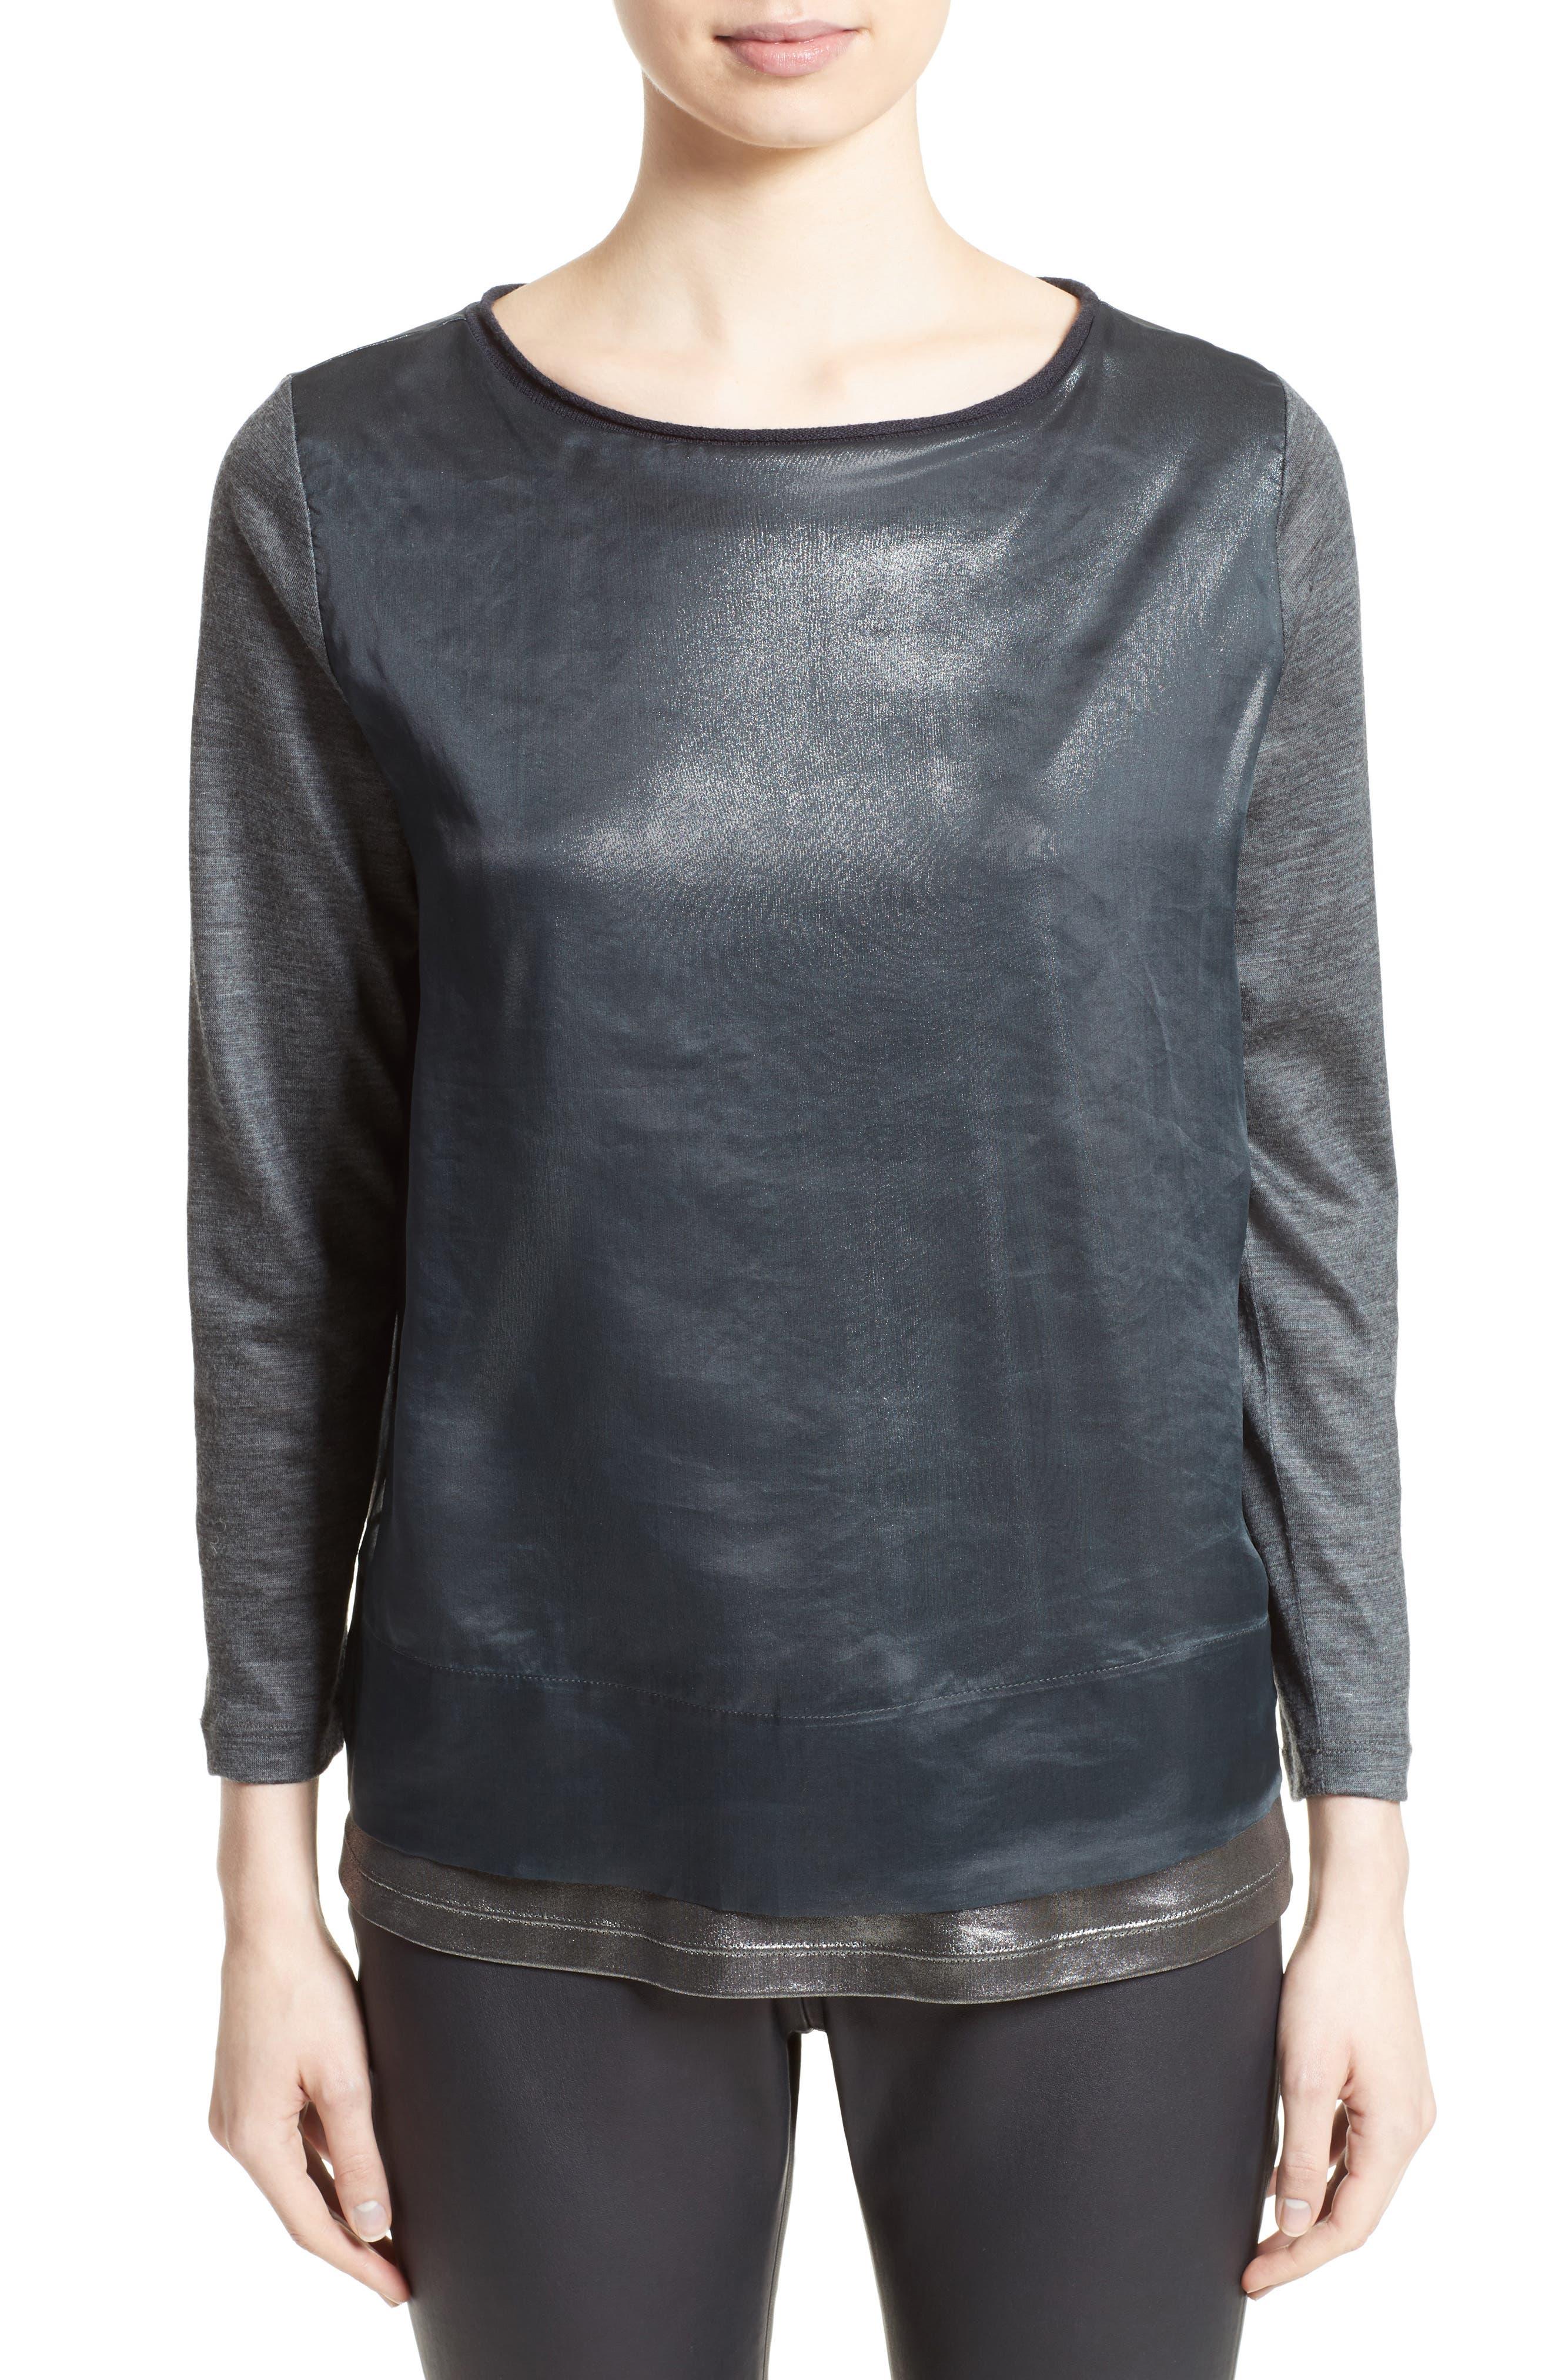 Fabiana Filippi Laminated Jersey Top with Metallic Organza Overlay